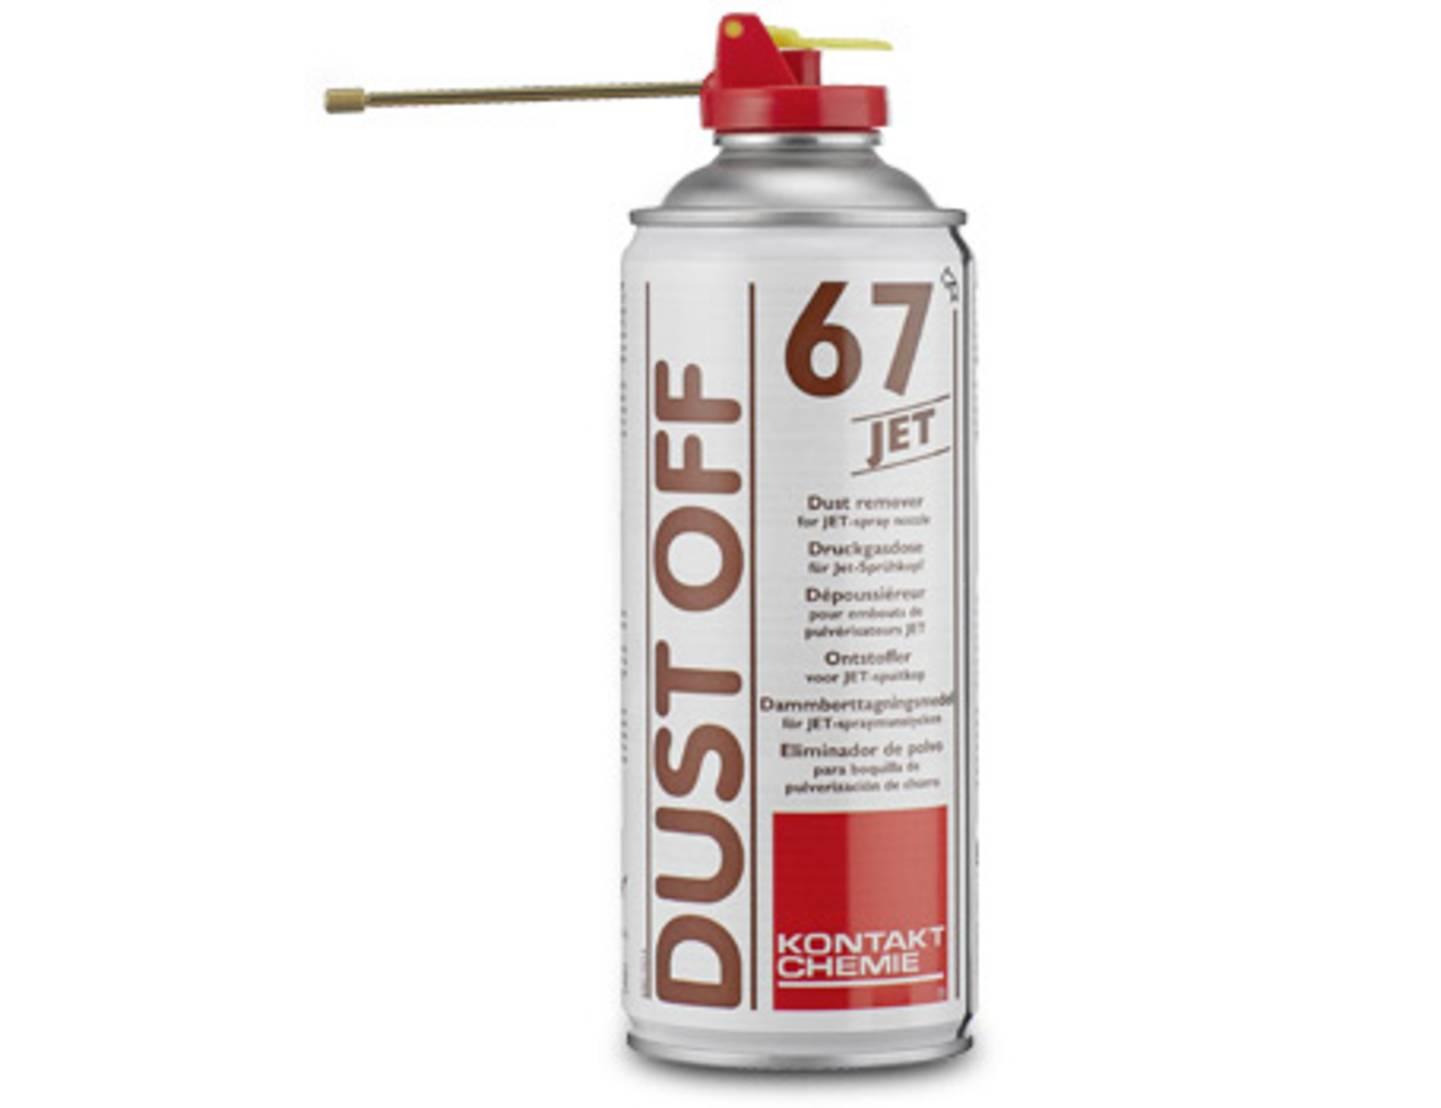 Dust Off 67 Jet